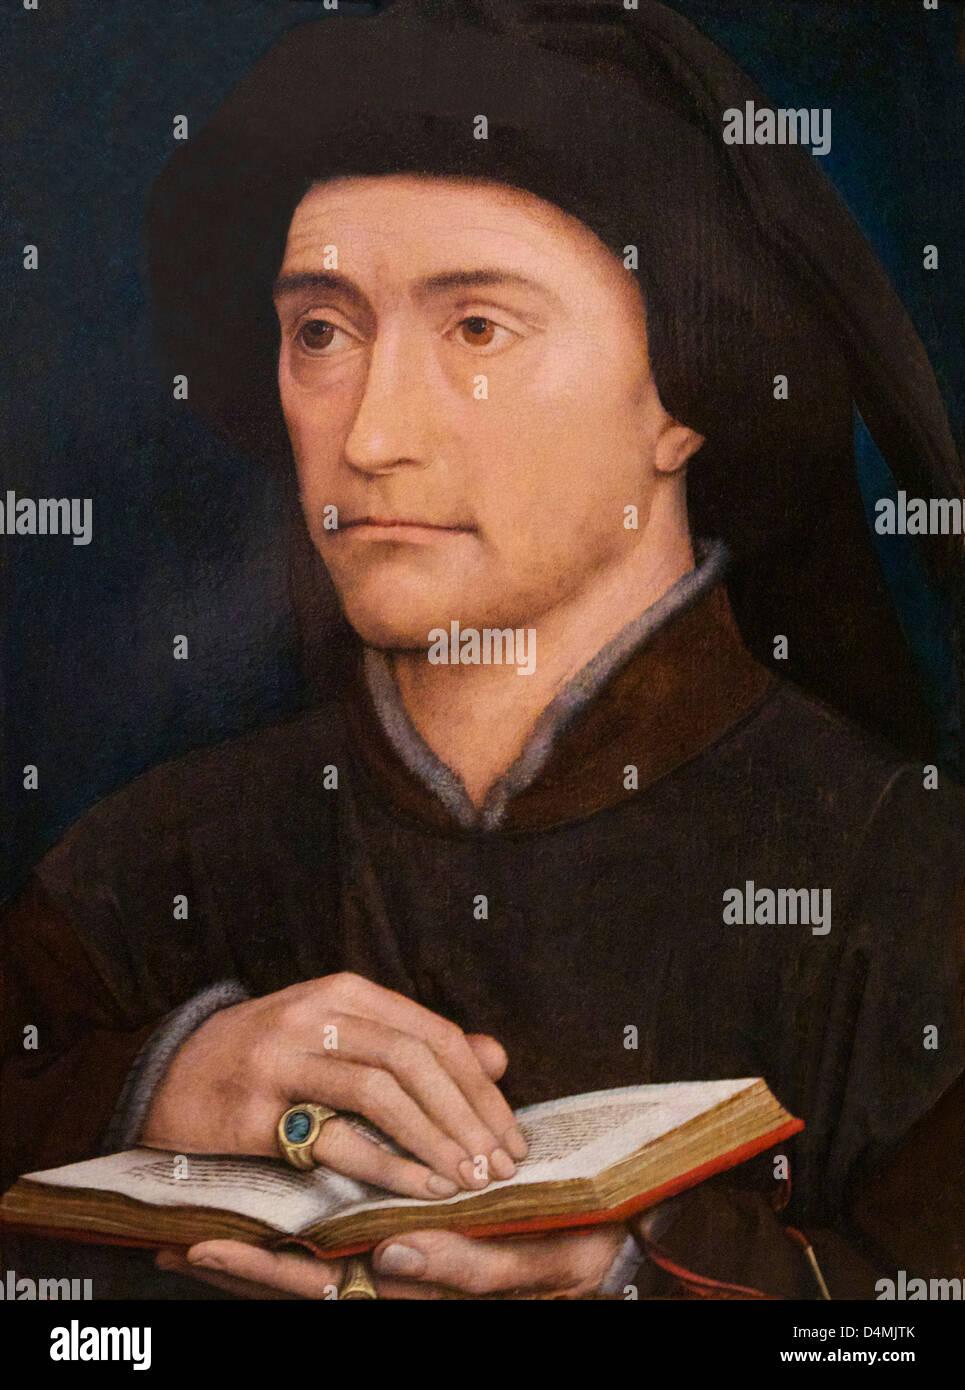 Portrait of a Man, Workshop of Rogier van der Weyden, 1430's,  Courtauld Institute of Art, Somerset House, London, - Stock Image